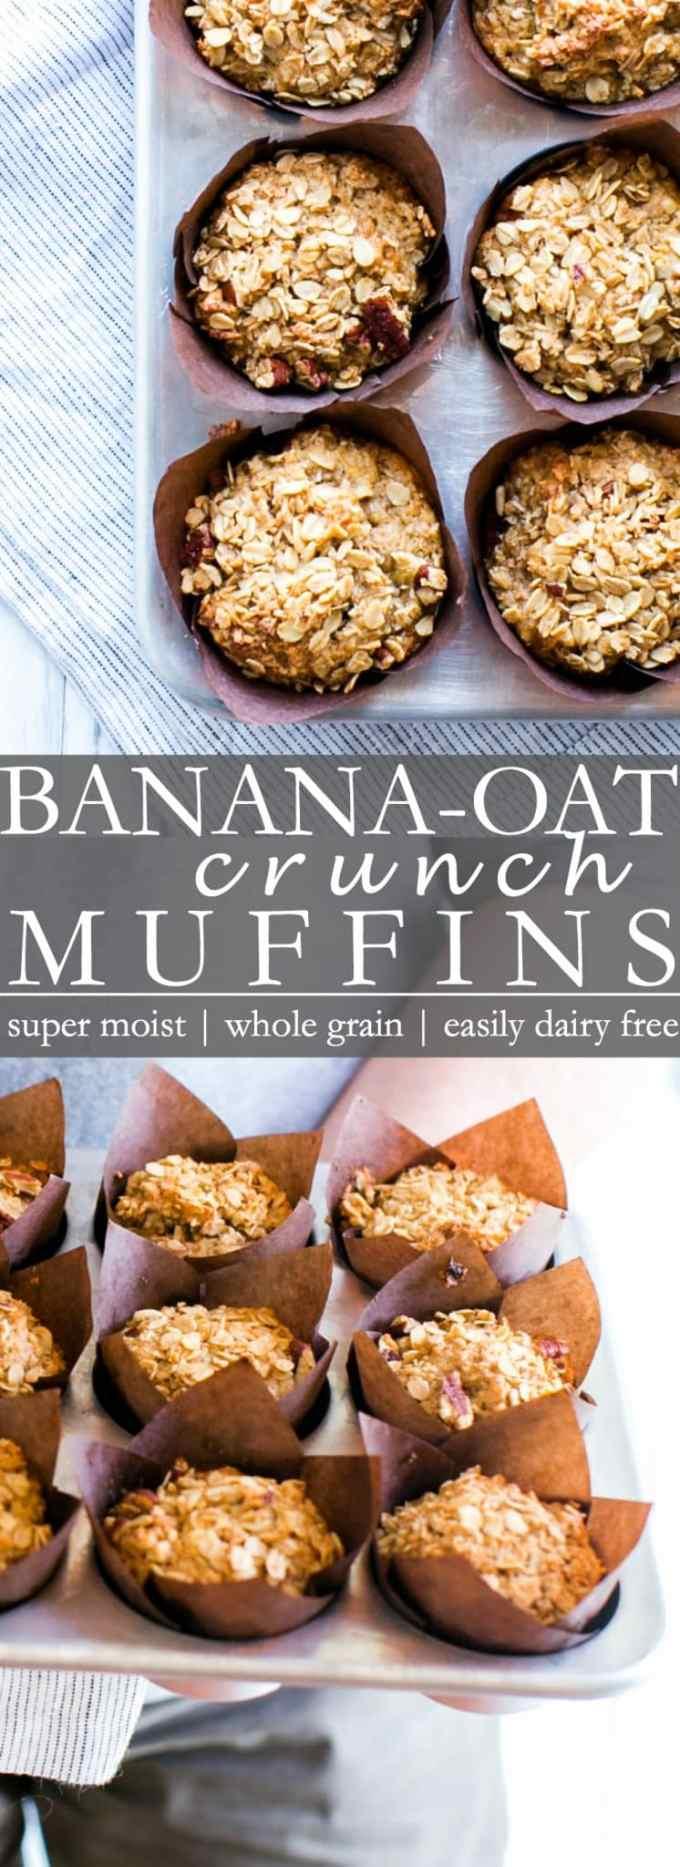 Banana Oat Crunch Muffins Pin